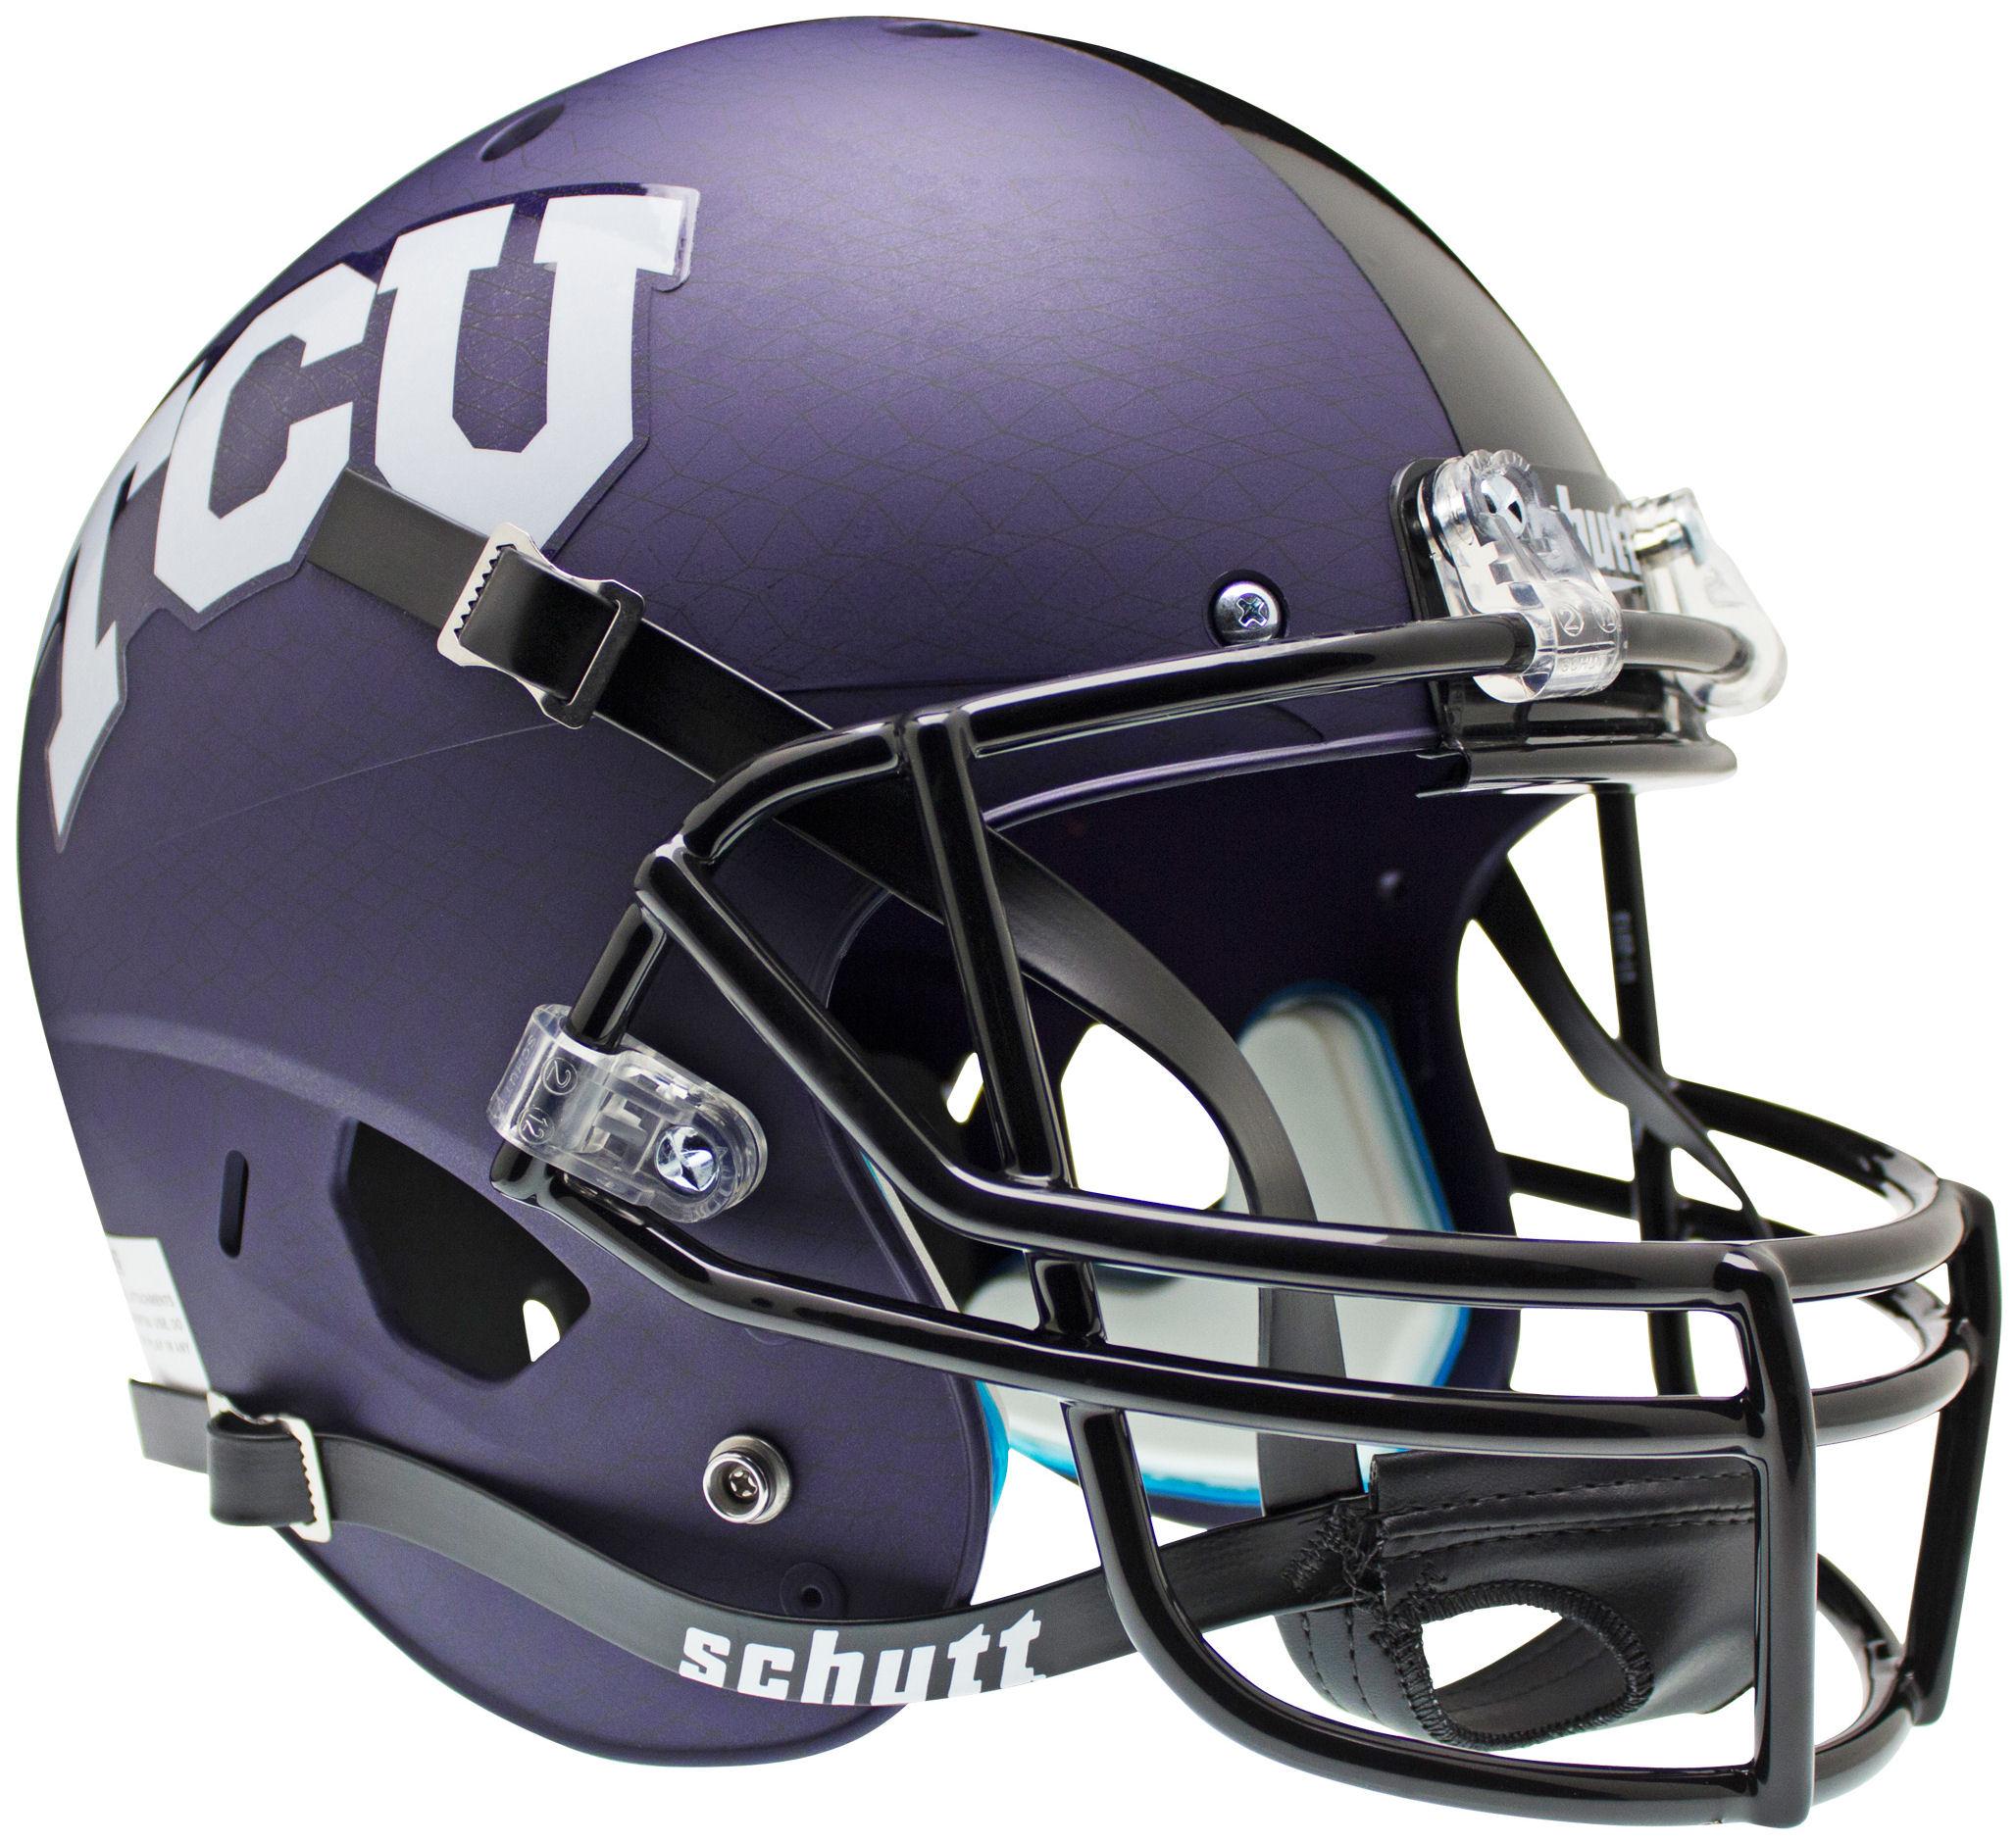 TCU Horned Frogs Full XP Replica Football Helmet Schutt <B>Purple Crosshatch</B>